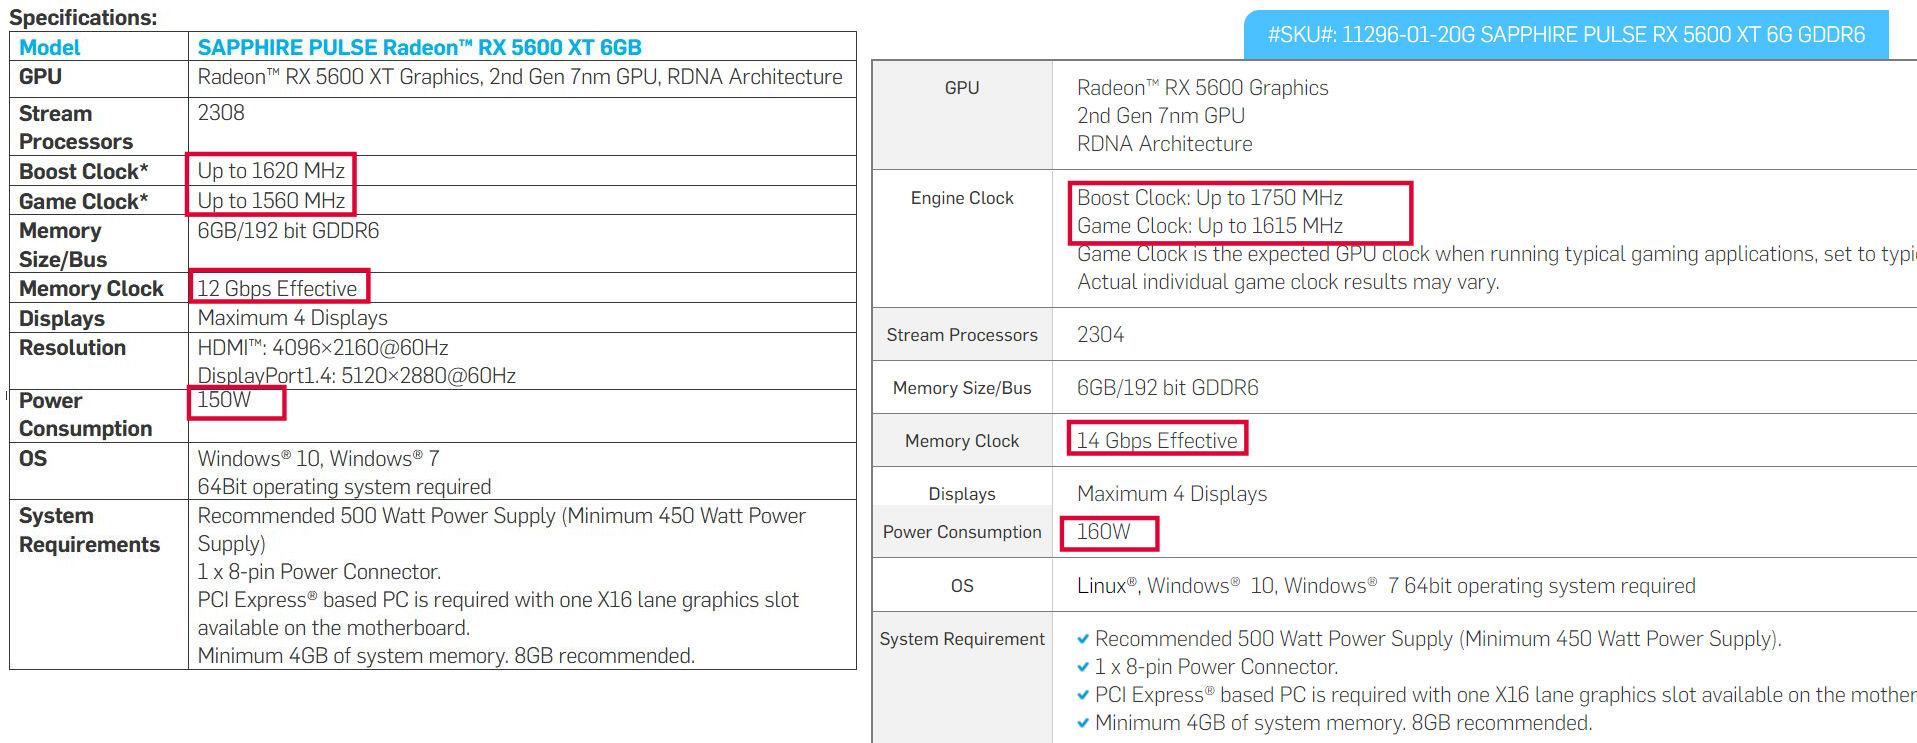 Sapphire-Radeon-RX-5600-XT-PULSE-Specs-Change.jpg